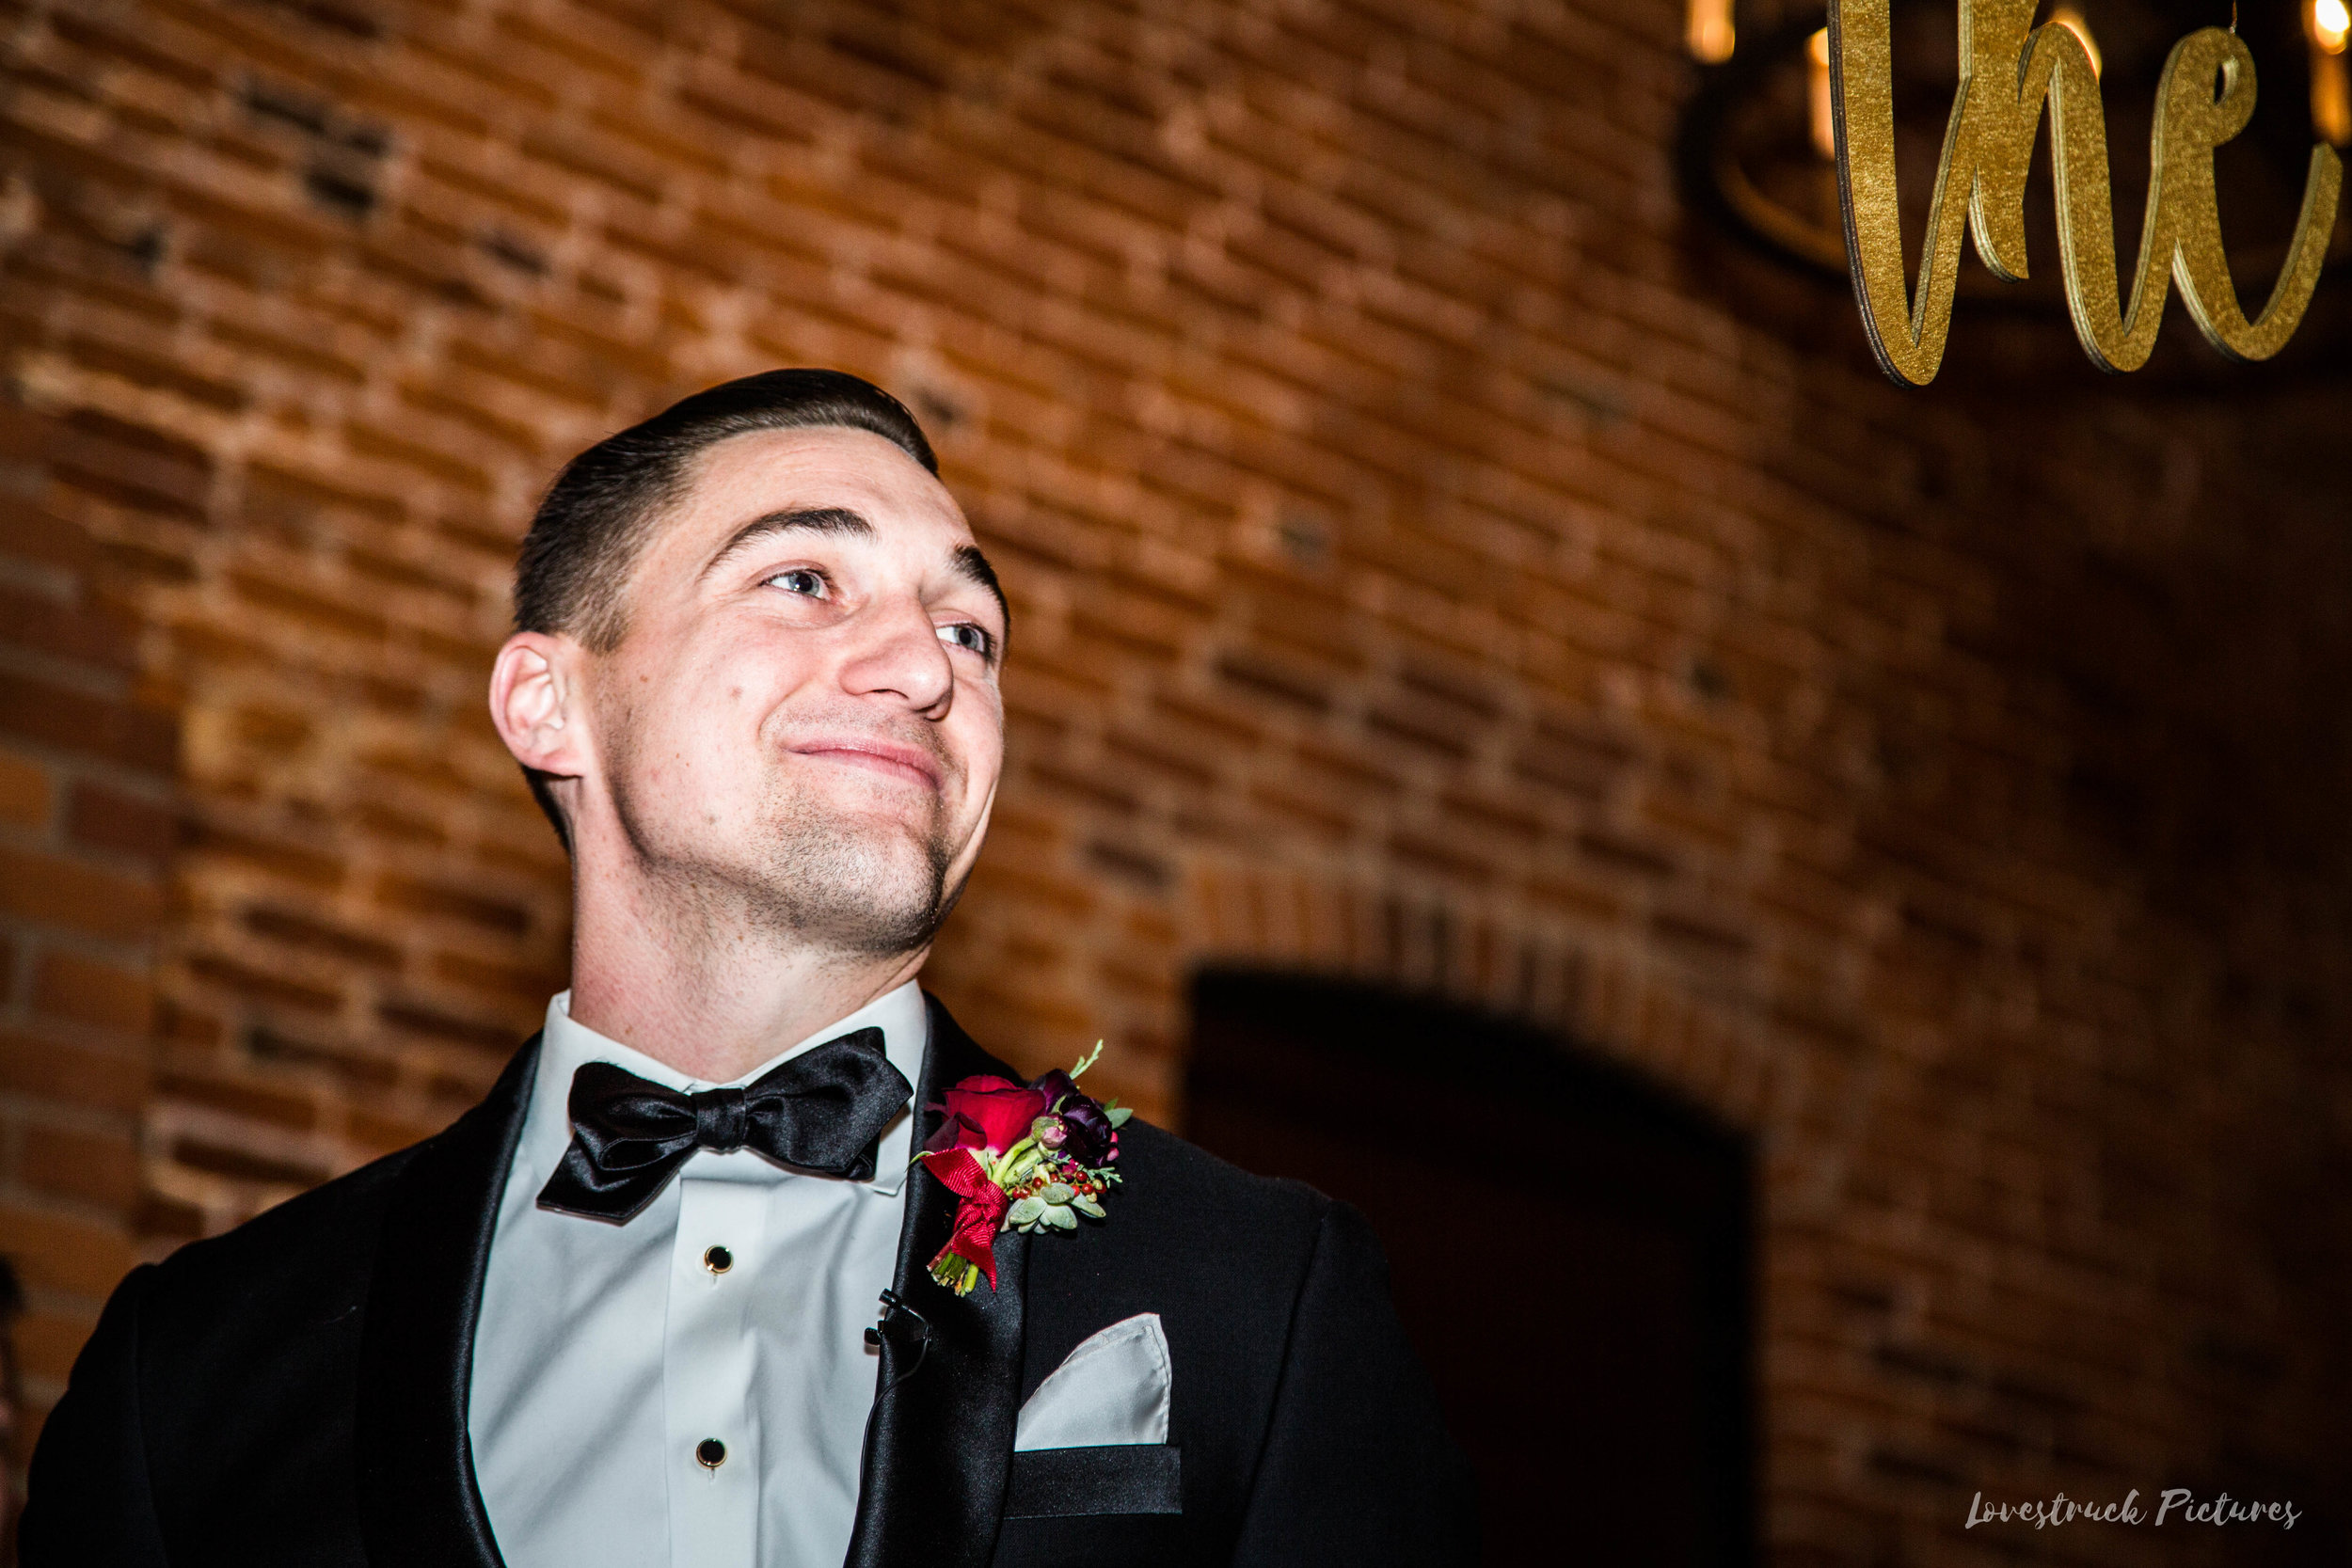 CORK_FACTORY_WEDDING_LANCASTER--281.jpg